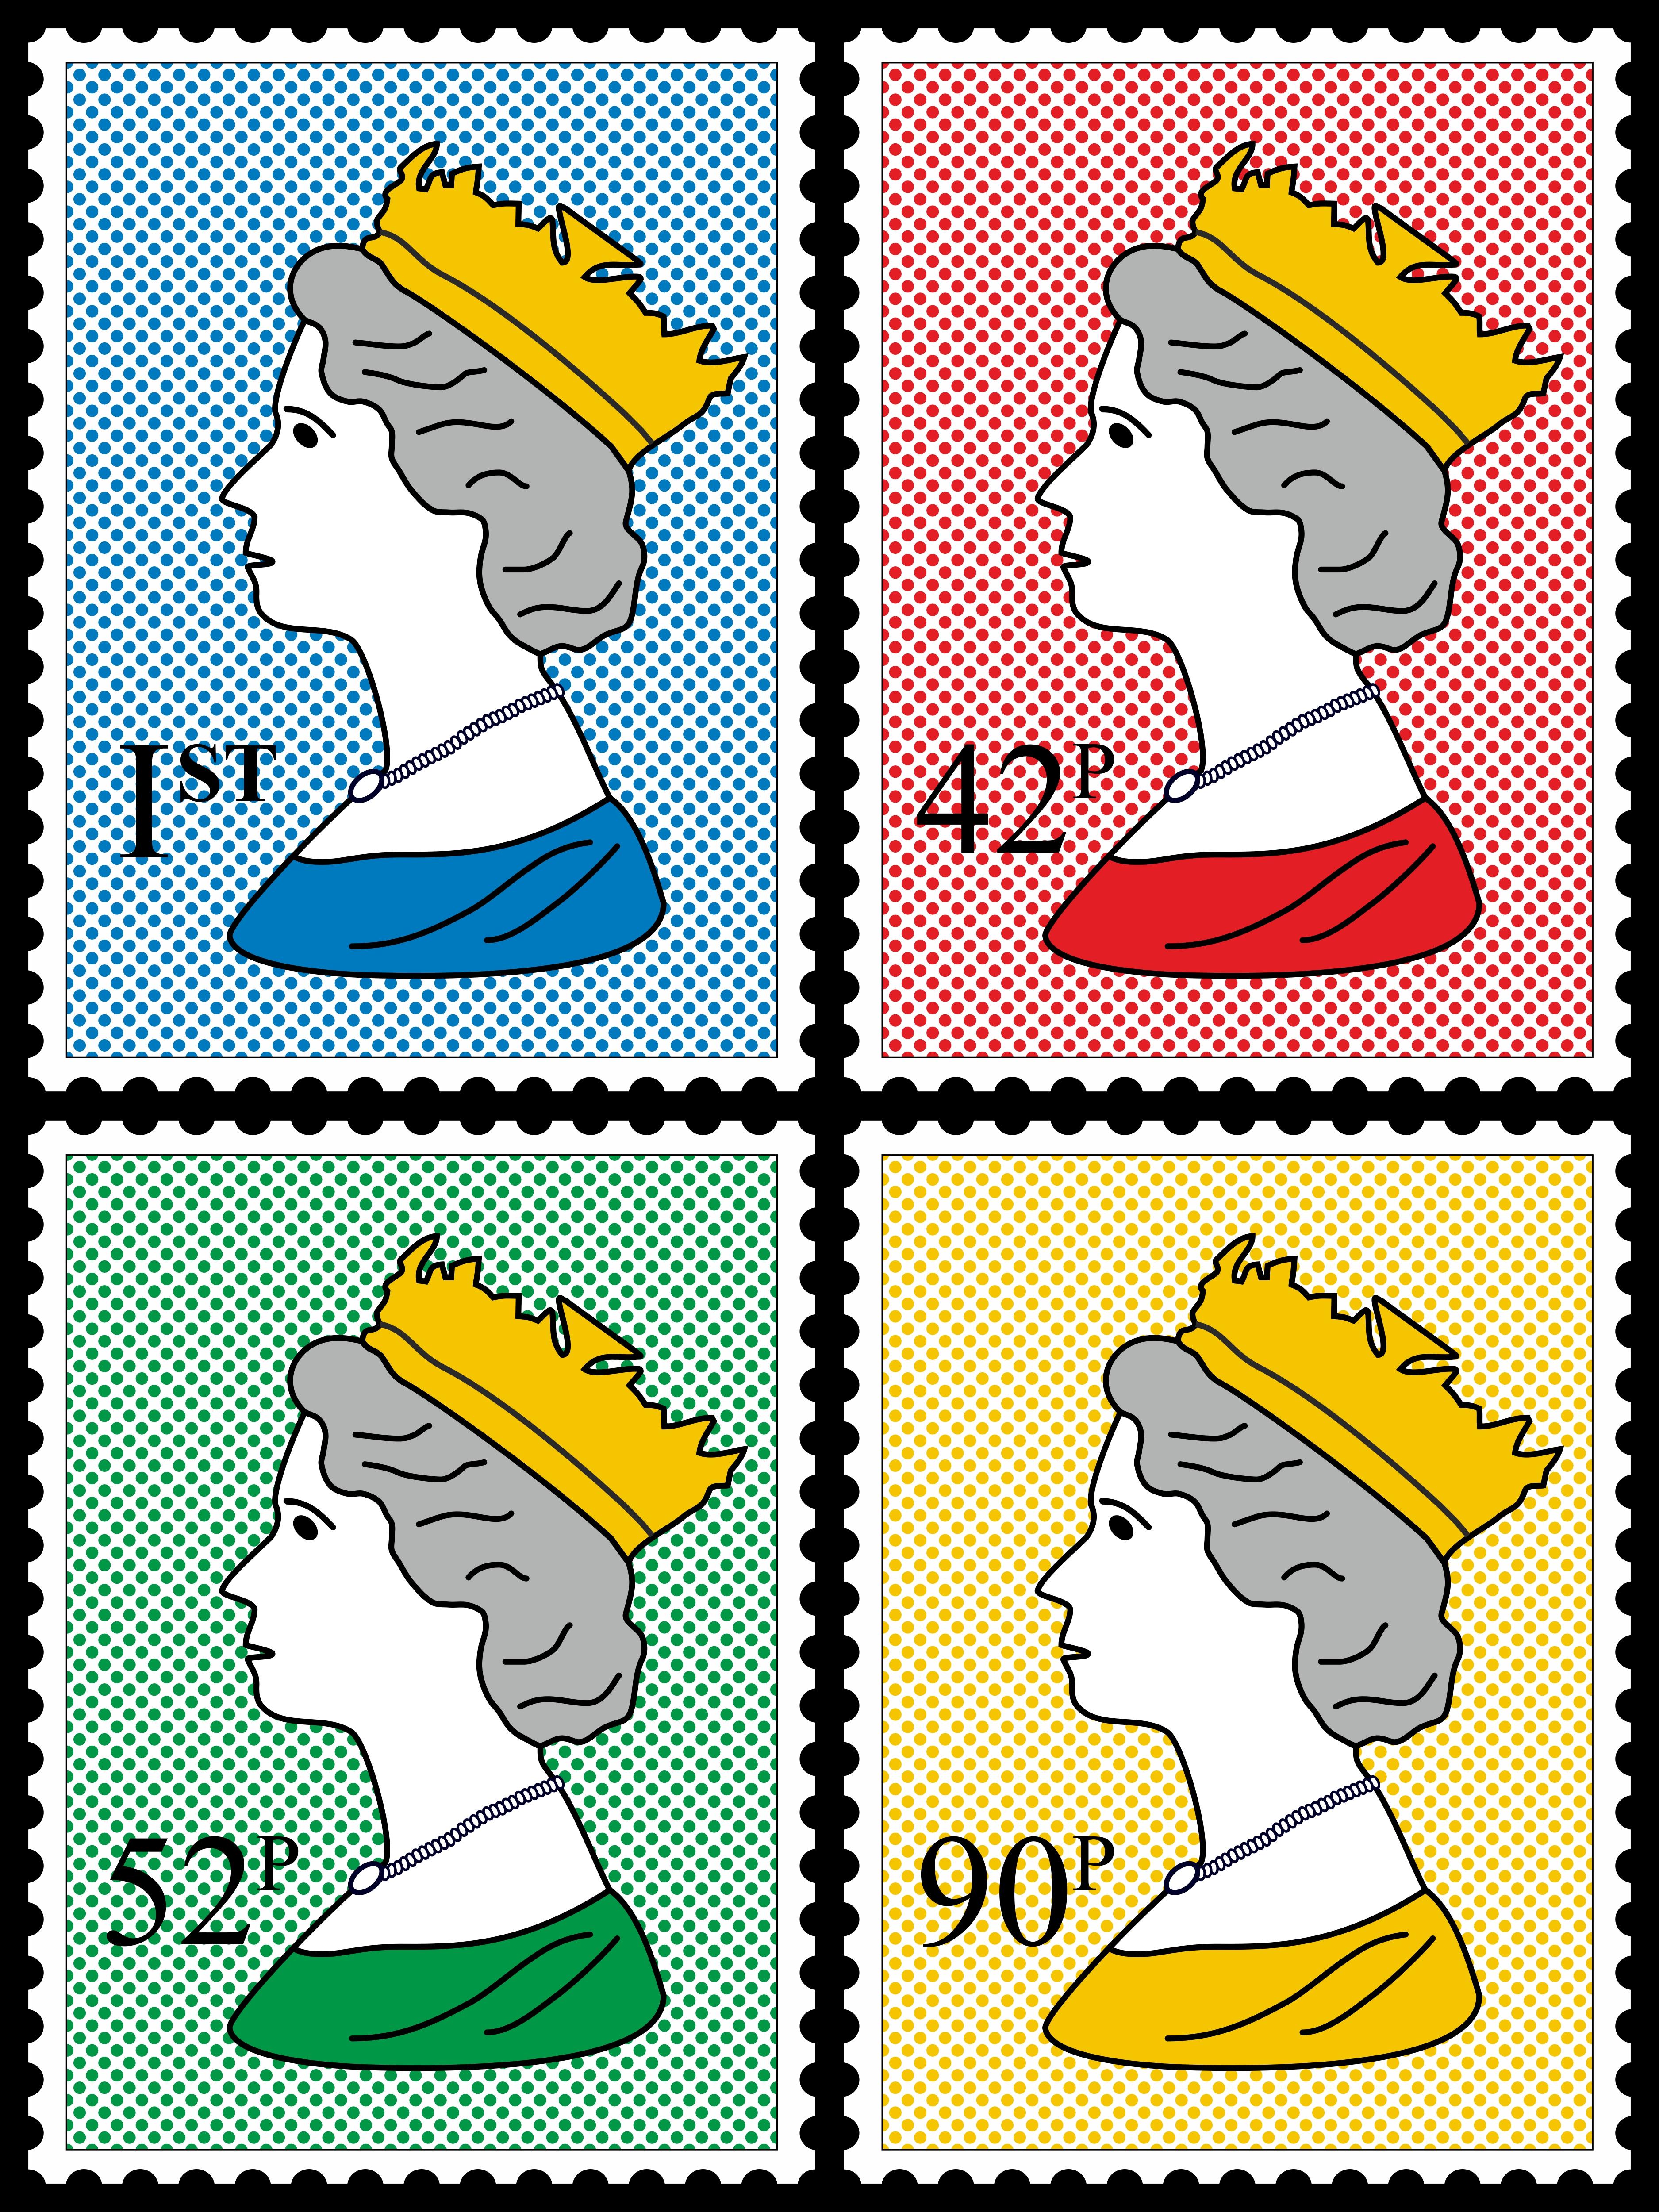 pop art gallery royal stamp poster 70x100cm high gloss art print